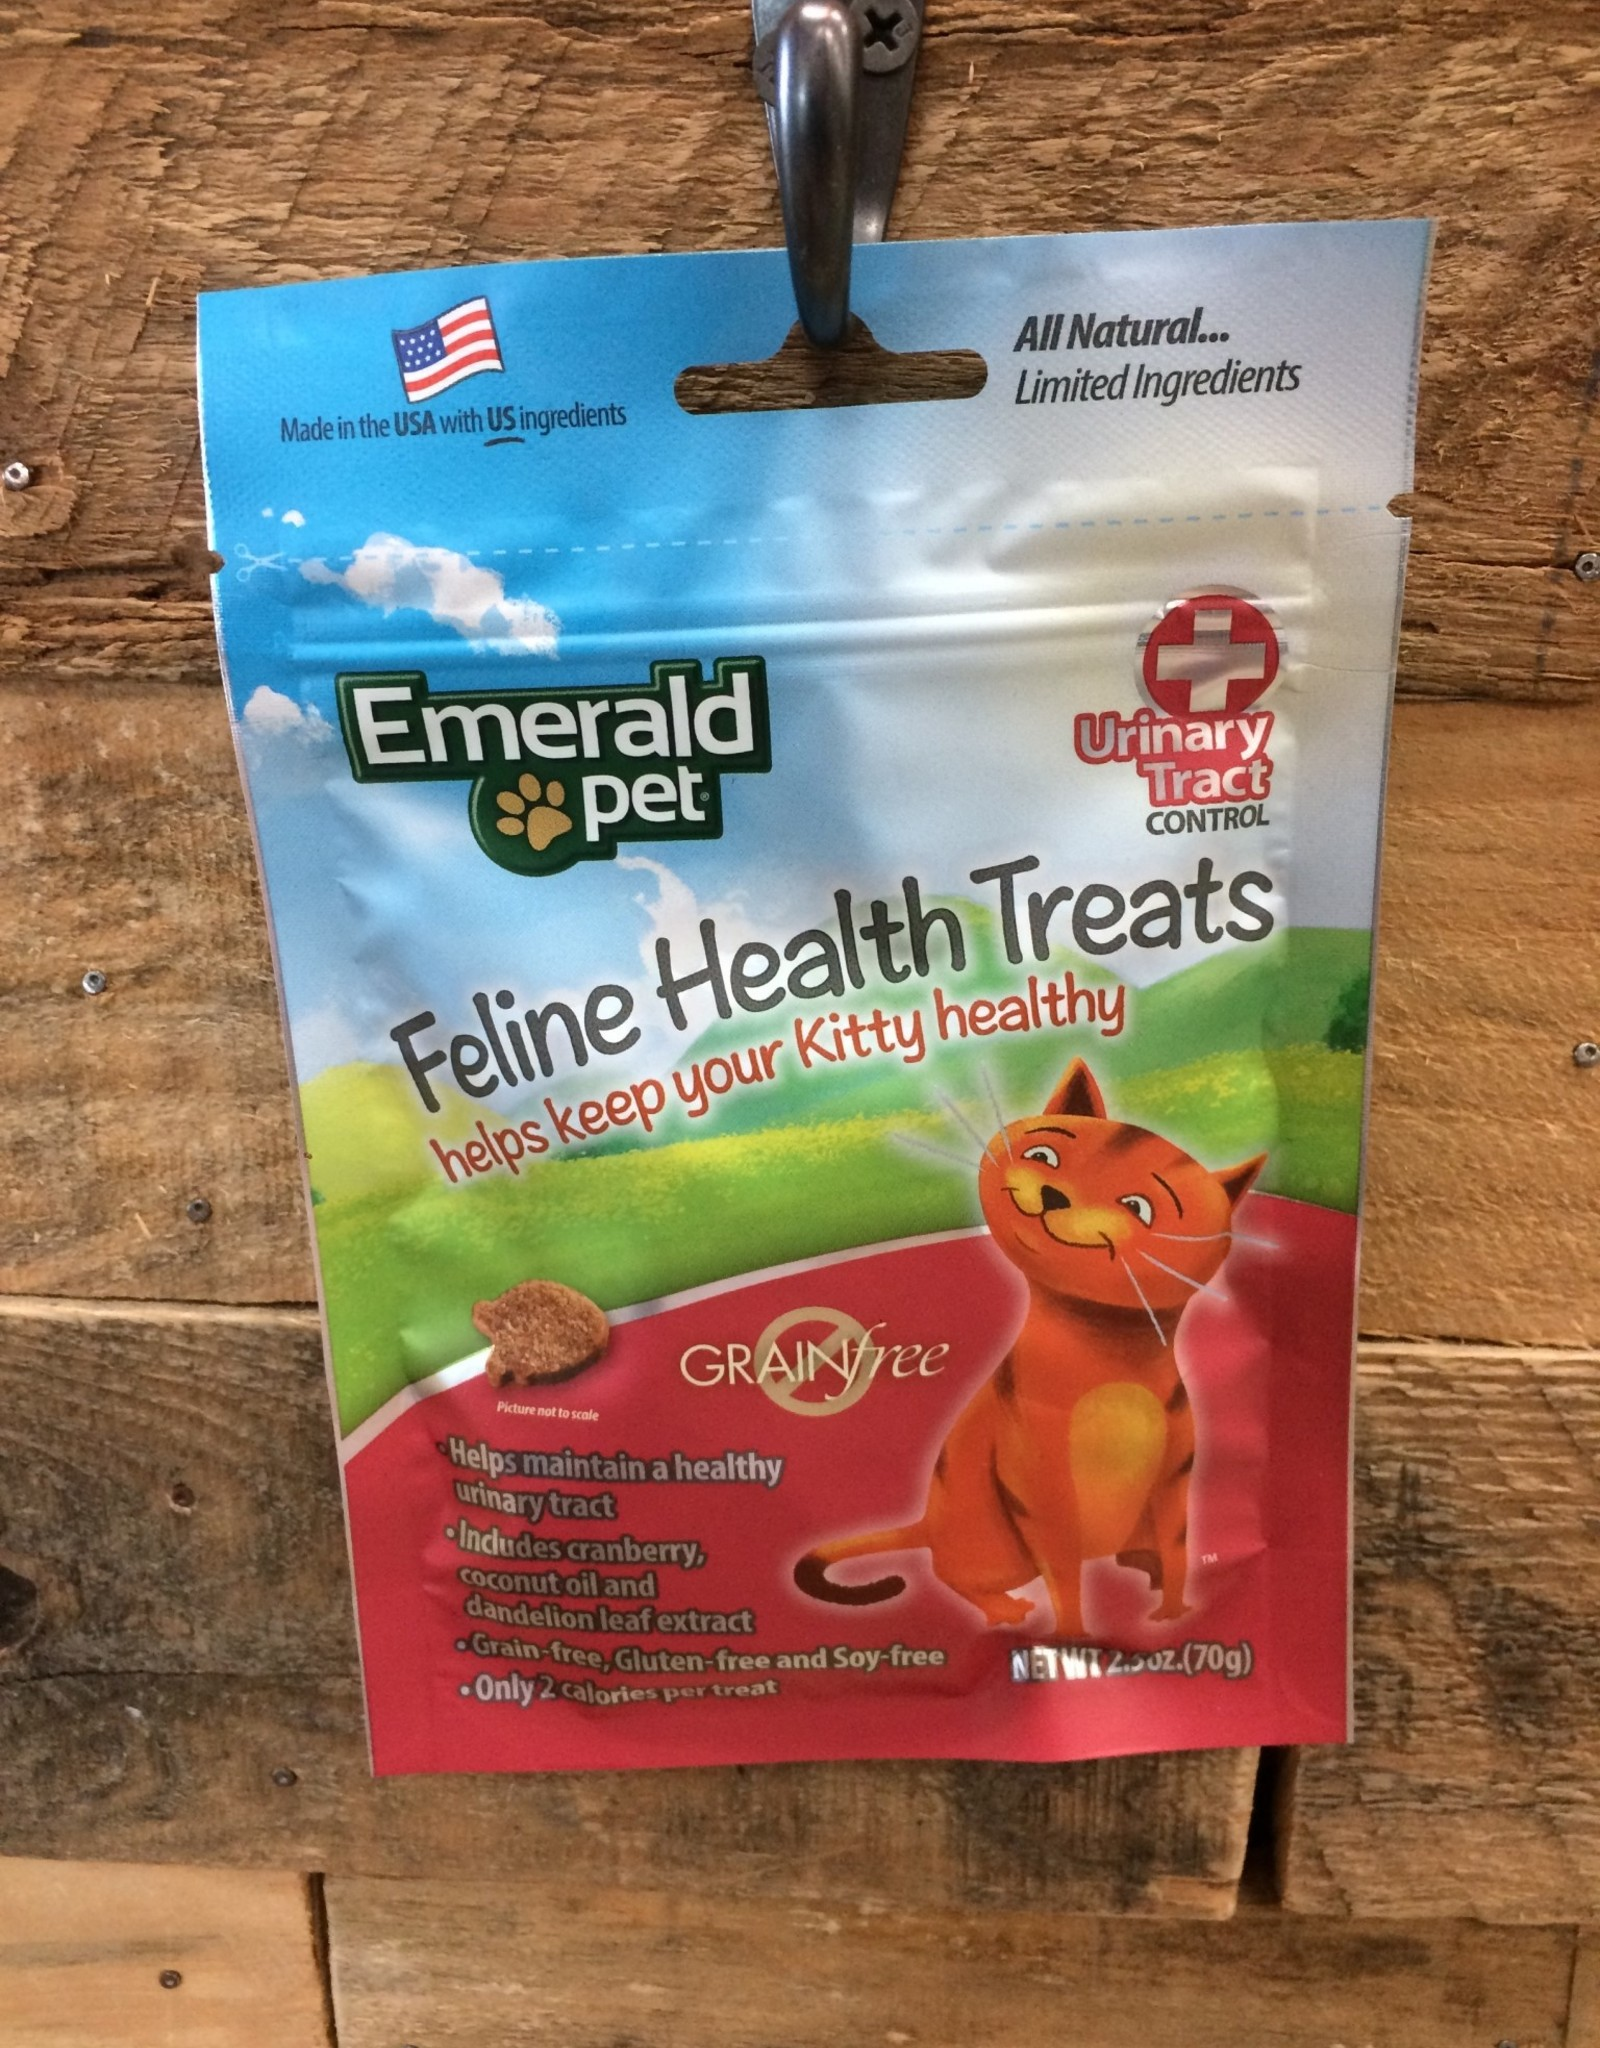 Emerald Pet Urinary Tract Formula Cat Treat - Chicken 2.5oz.